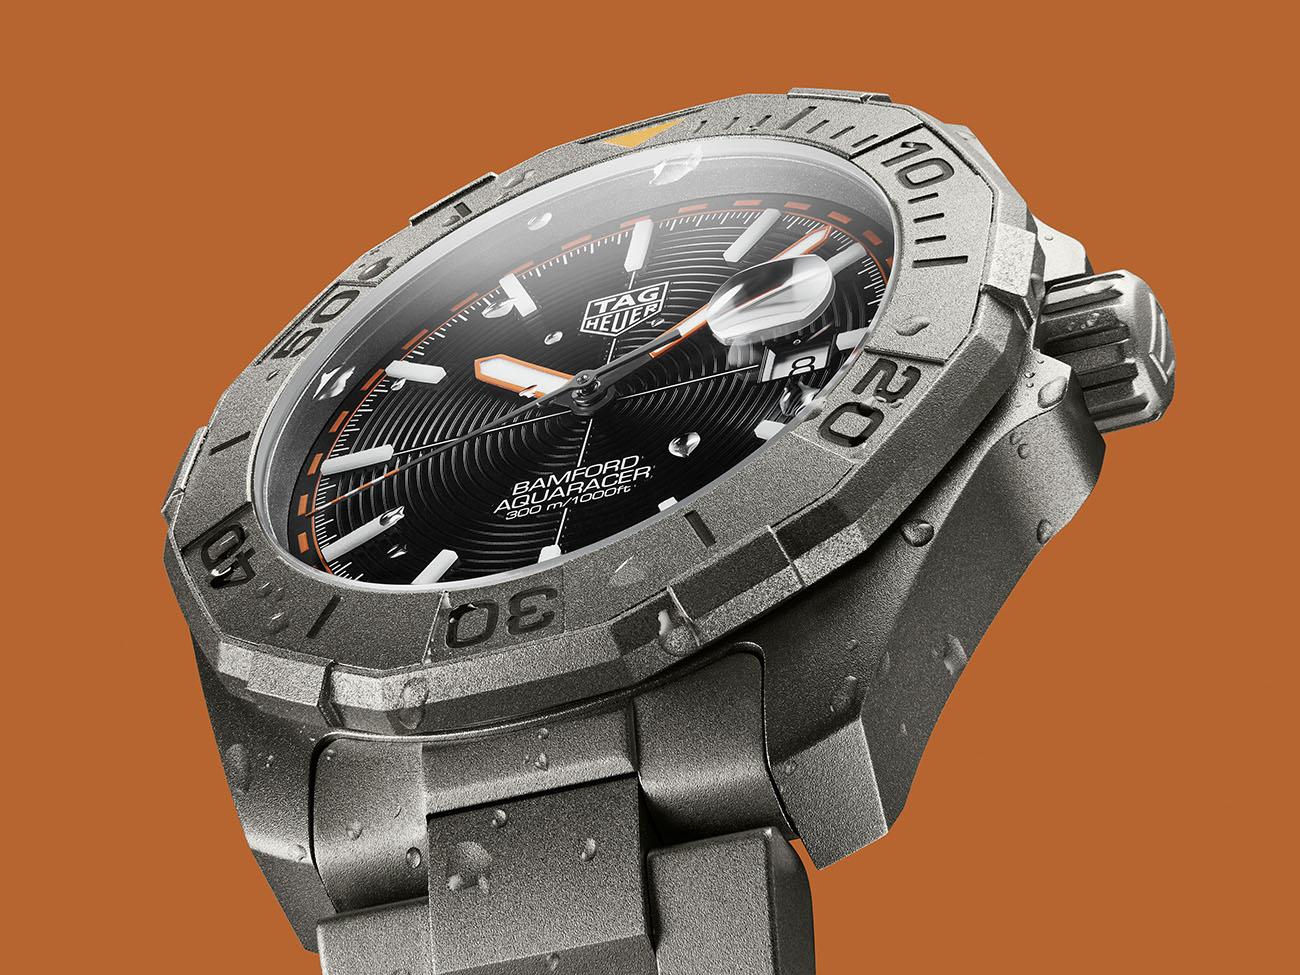 TAG Heuer Aquaracer Calibre 5 x Bamford Watch Department